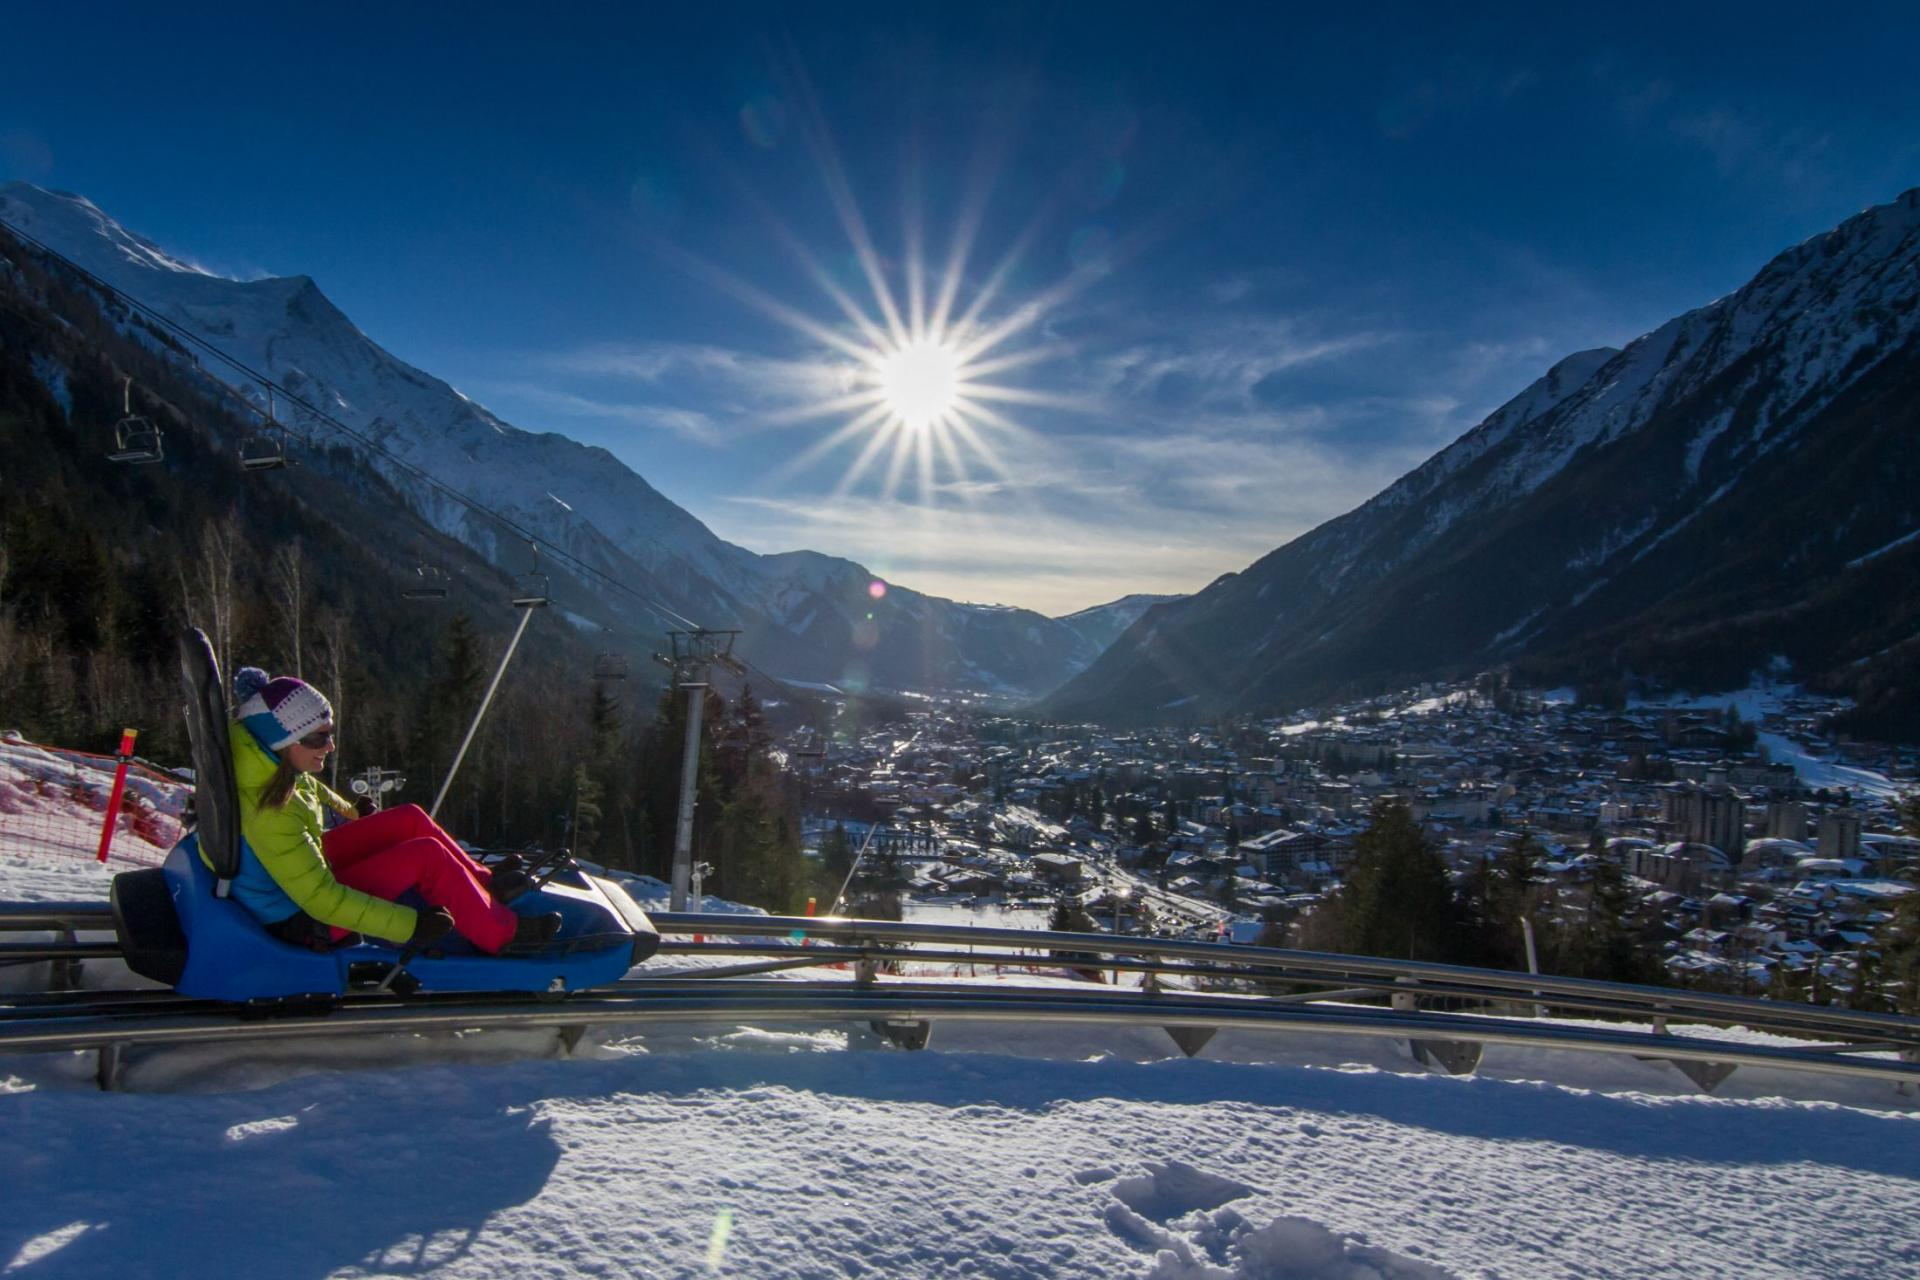 Luge Alpine Coaster Hiver